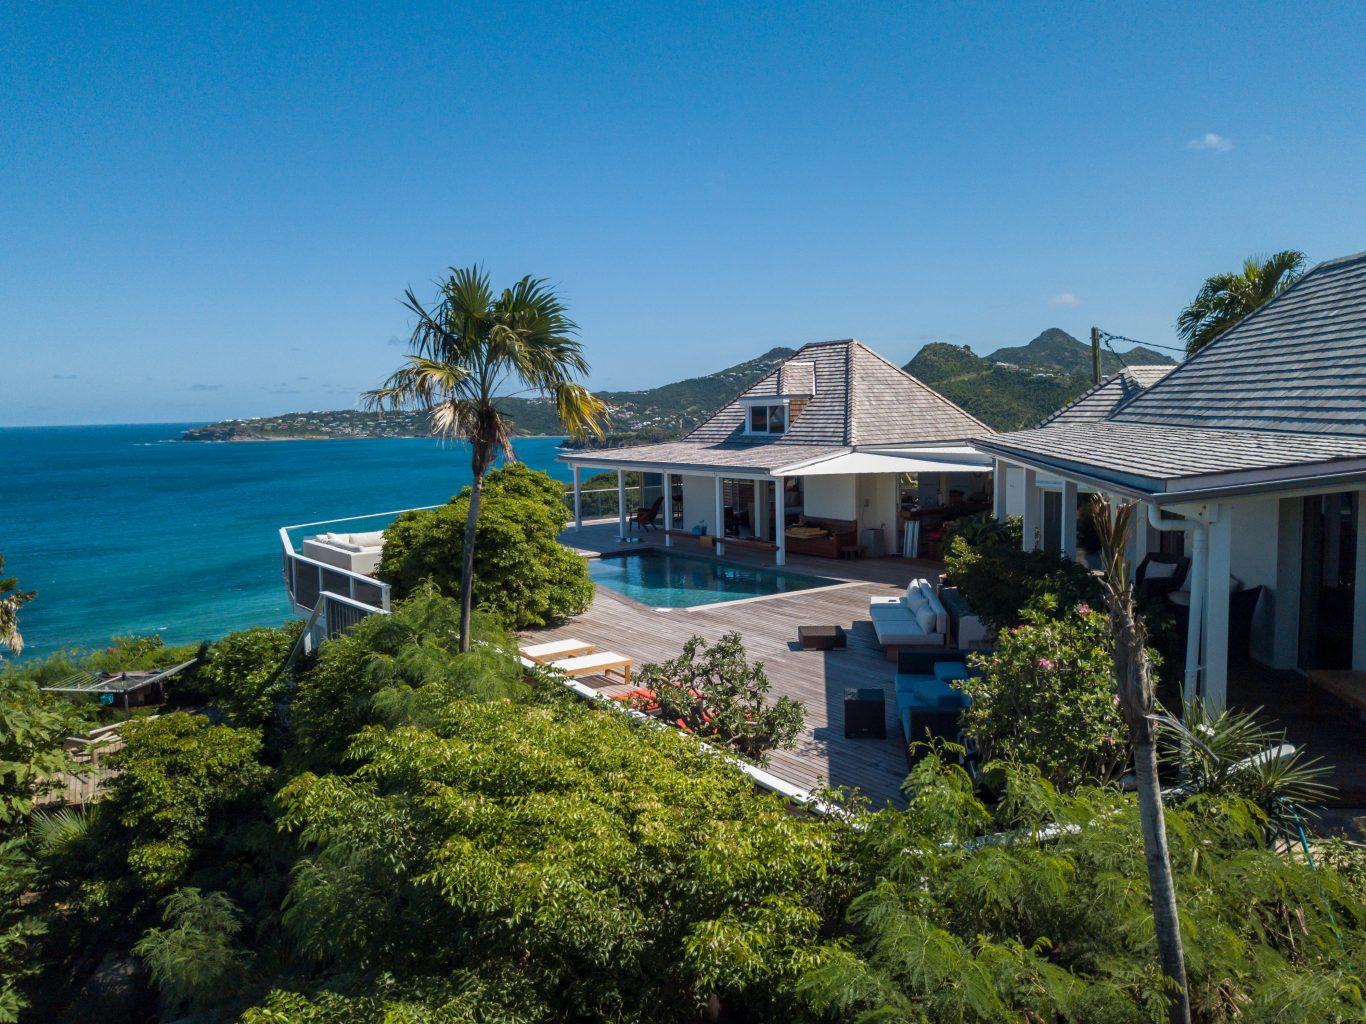 Villa Gaillac - Creole Villa Rental St Barth Sea View - Outside view